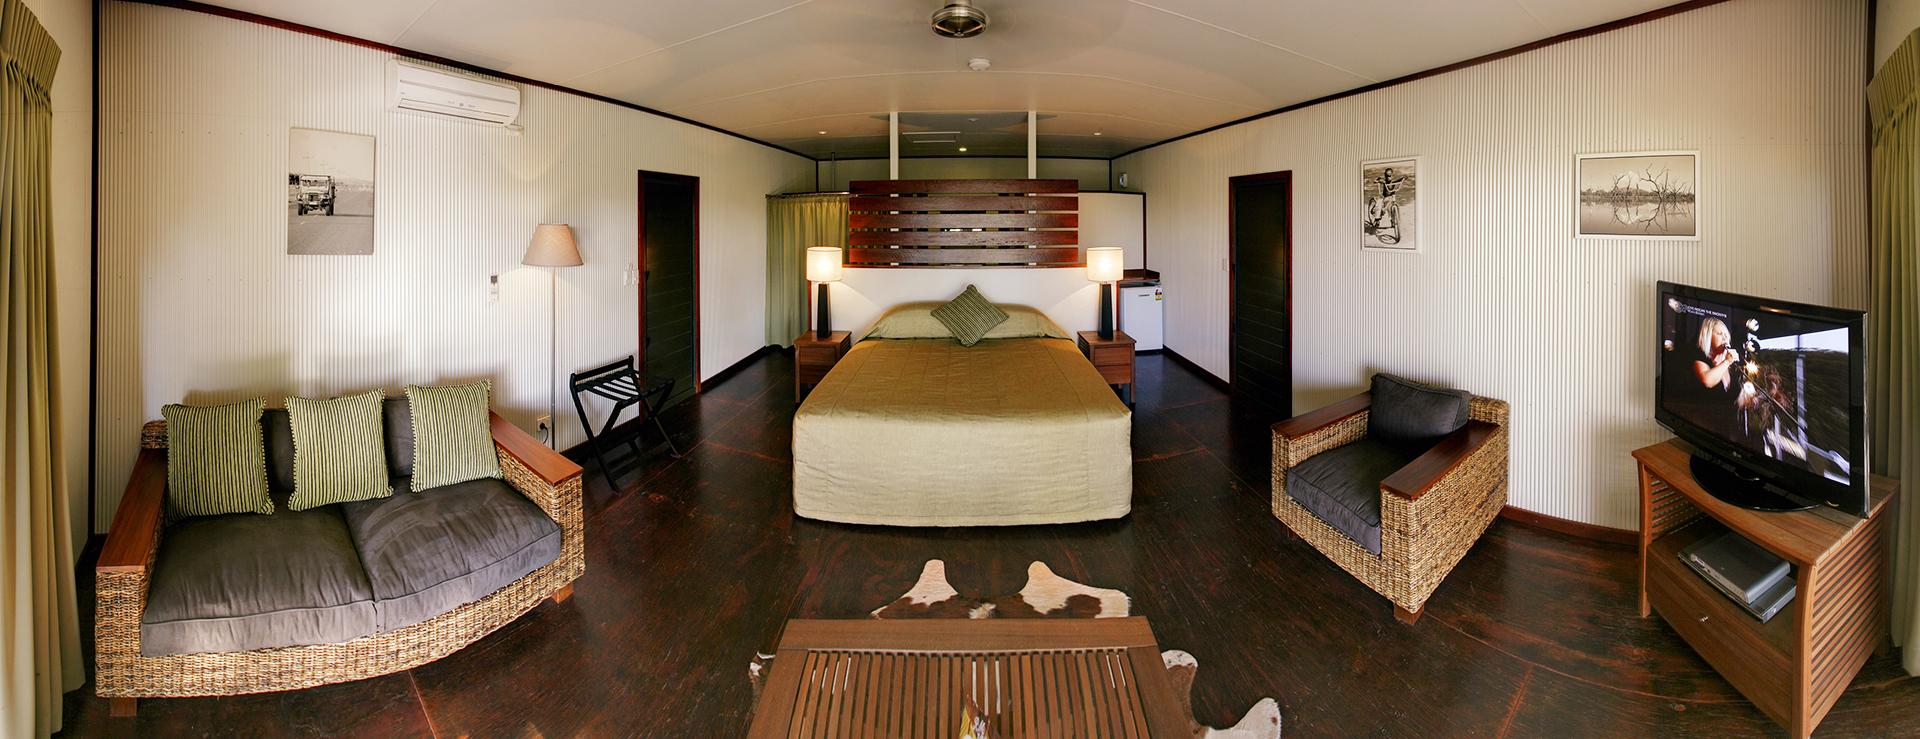 Home ValleyAccommodation Grass_Castles_0002.jpg